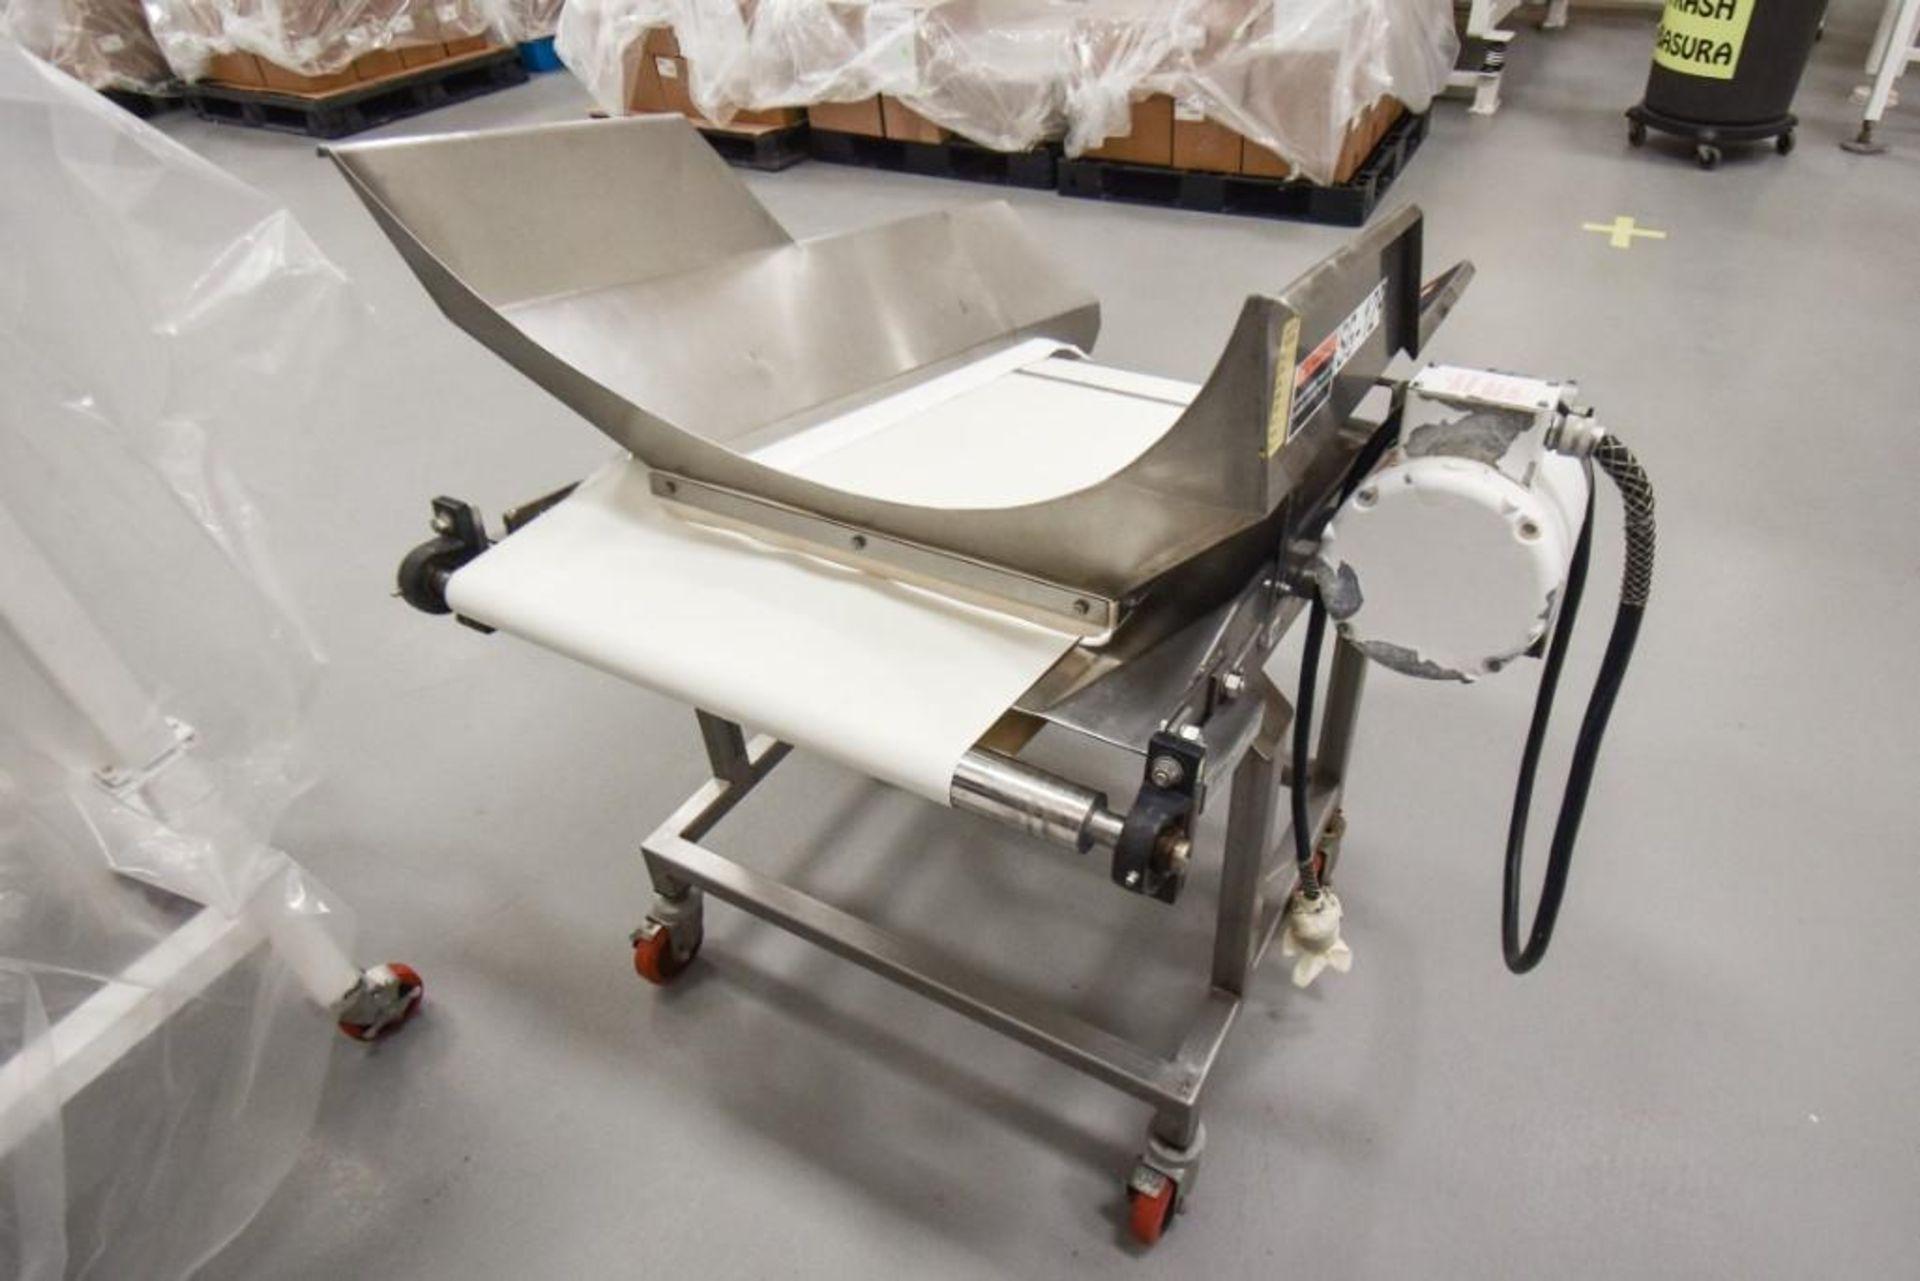 RBM Vibratory Deck With Food Grade Conveyor TS-B 24X3-0 - Image 4 of 7